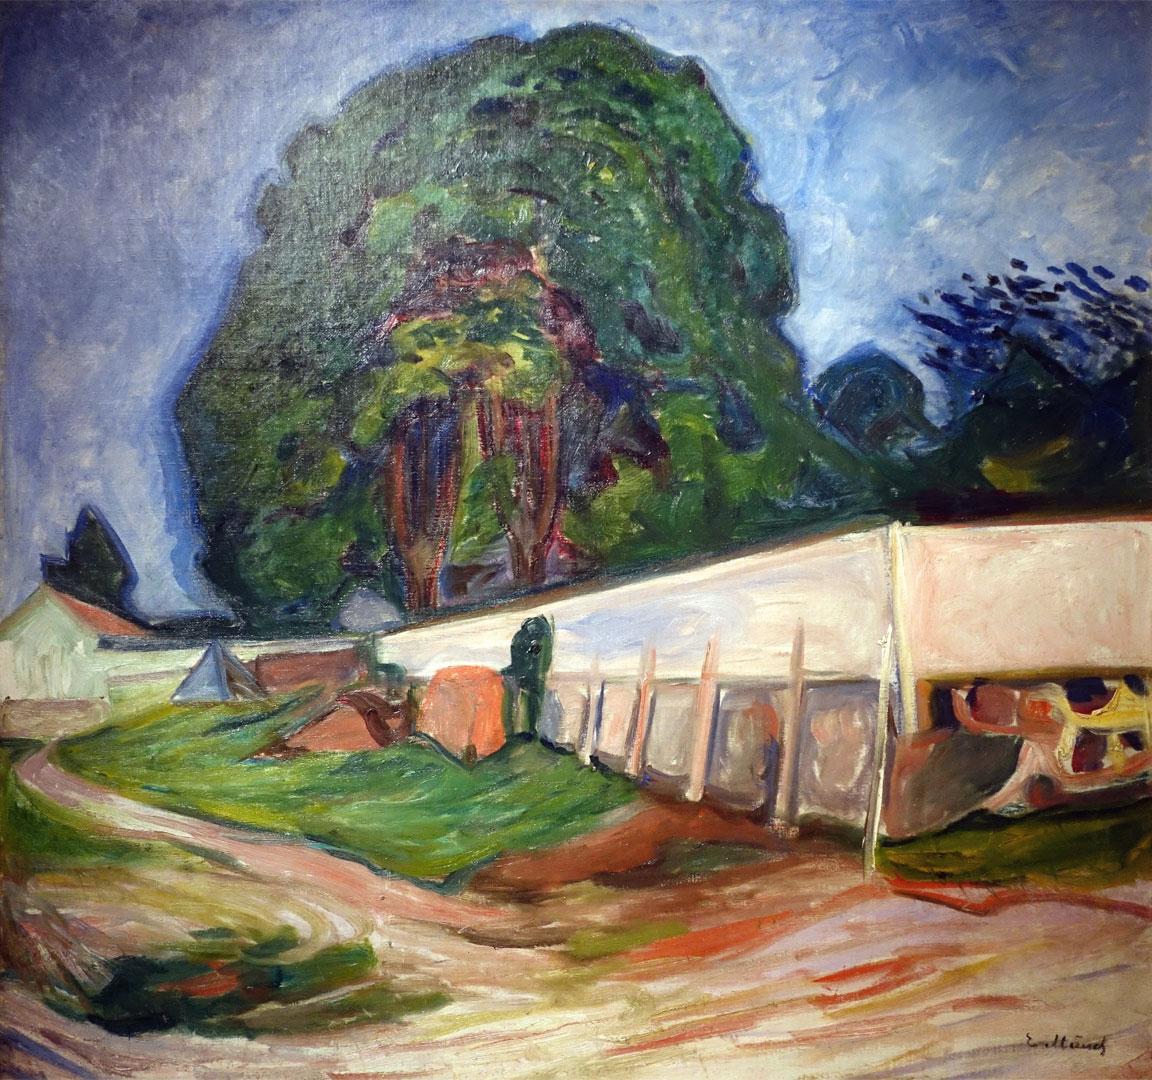 Munch - Notte d estate ad Asgaardstrand - Nuit d ete a Asgaardstrand - Summer Night at Asgaardstrand - 1904